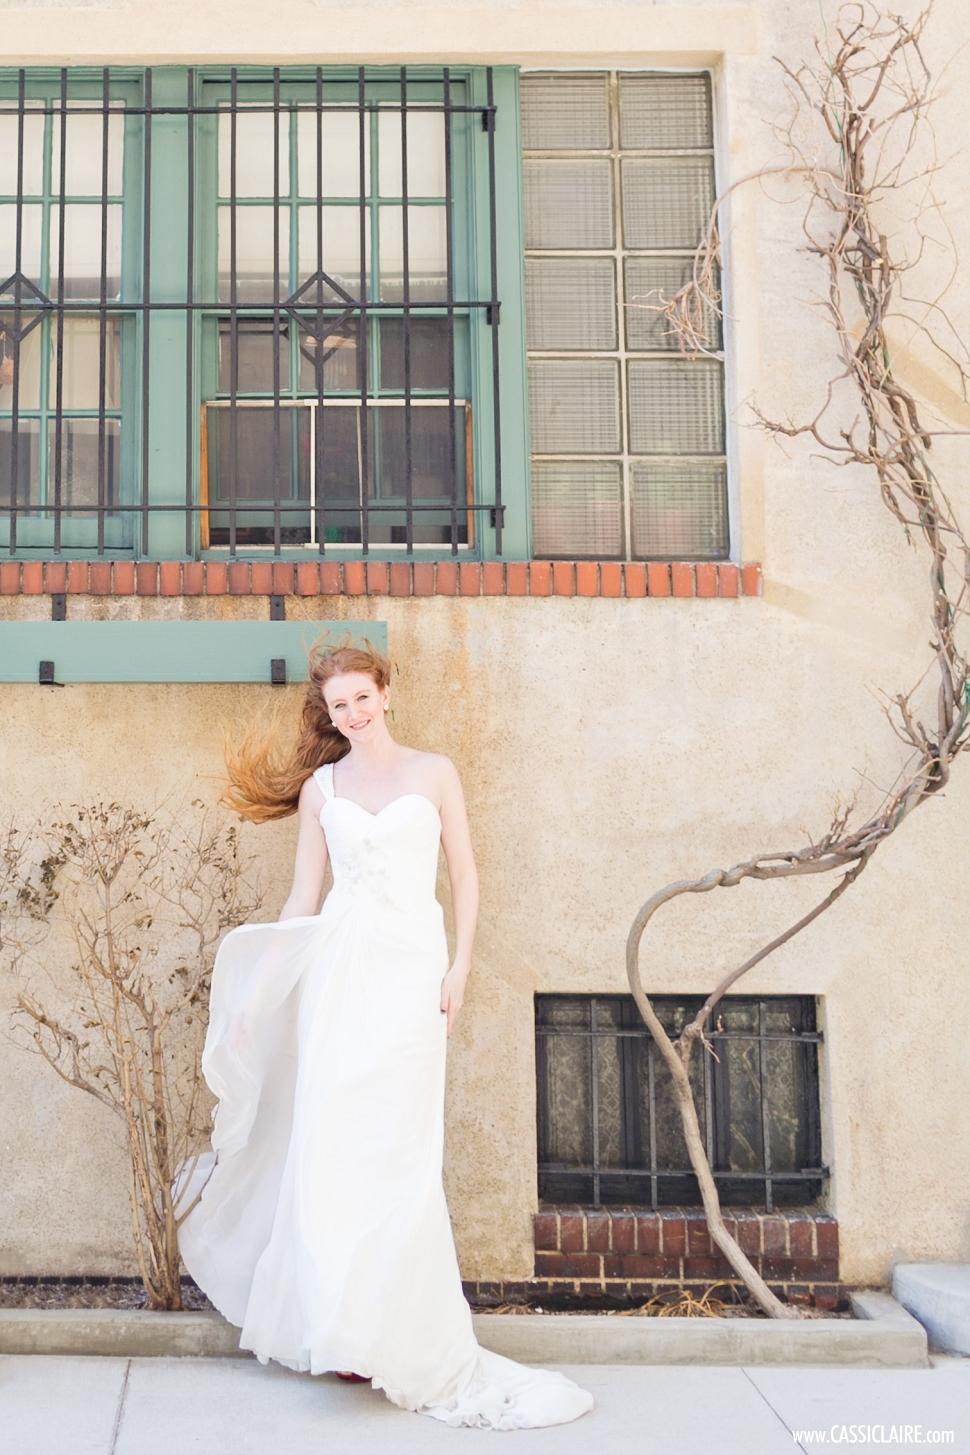 Washington-Square-Park-Wedding-Photos_Cassi-Claire_09.jpg